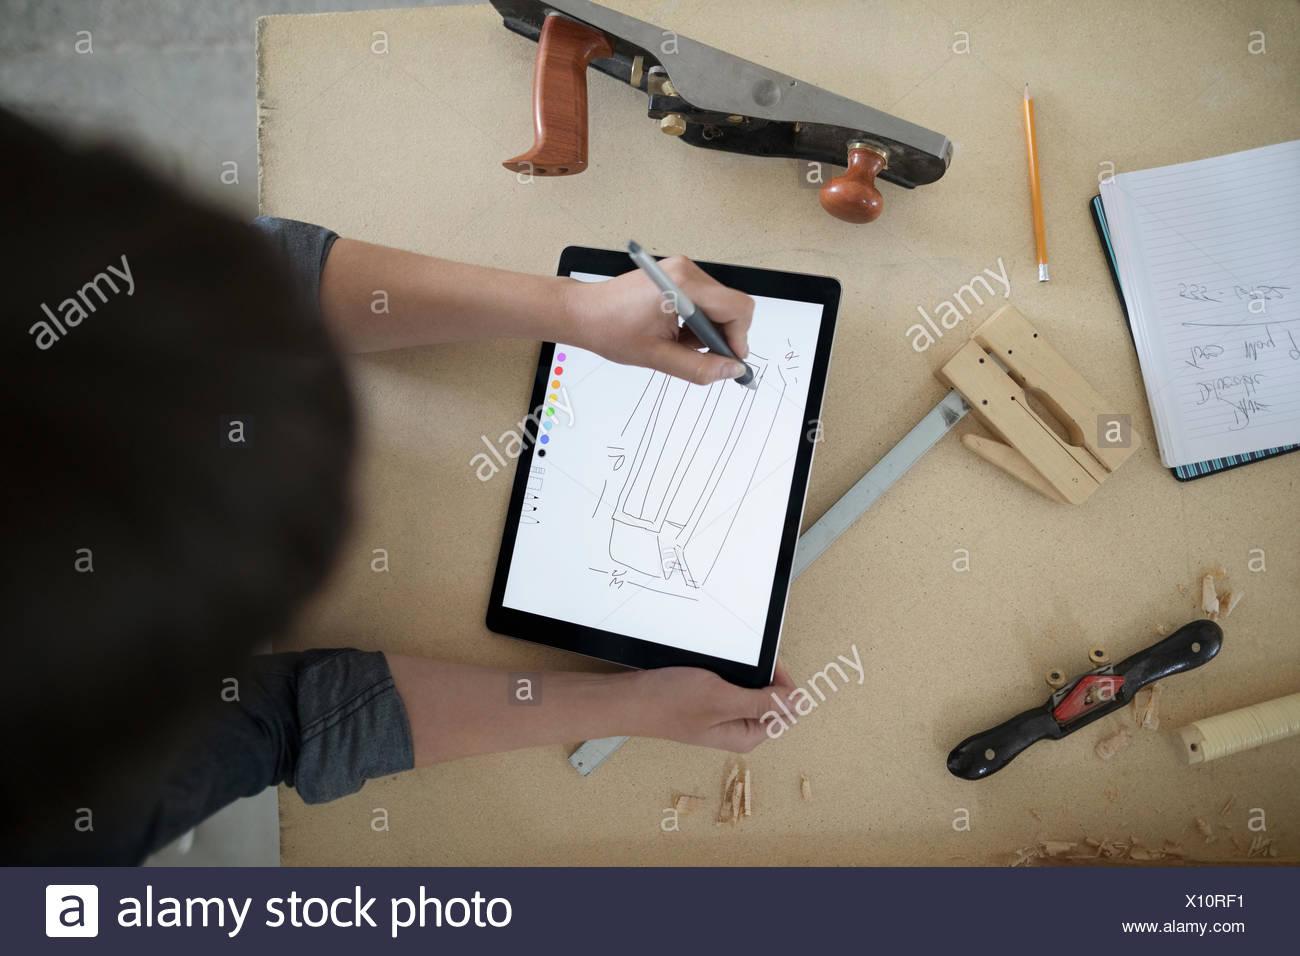 Vista desde arriba de carpintero hembra dibujar con tableta digital stylus en workbench en el taller Imagen De Stock